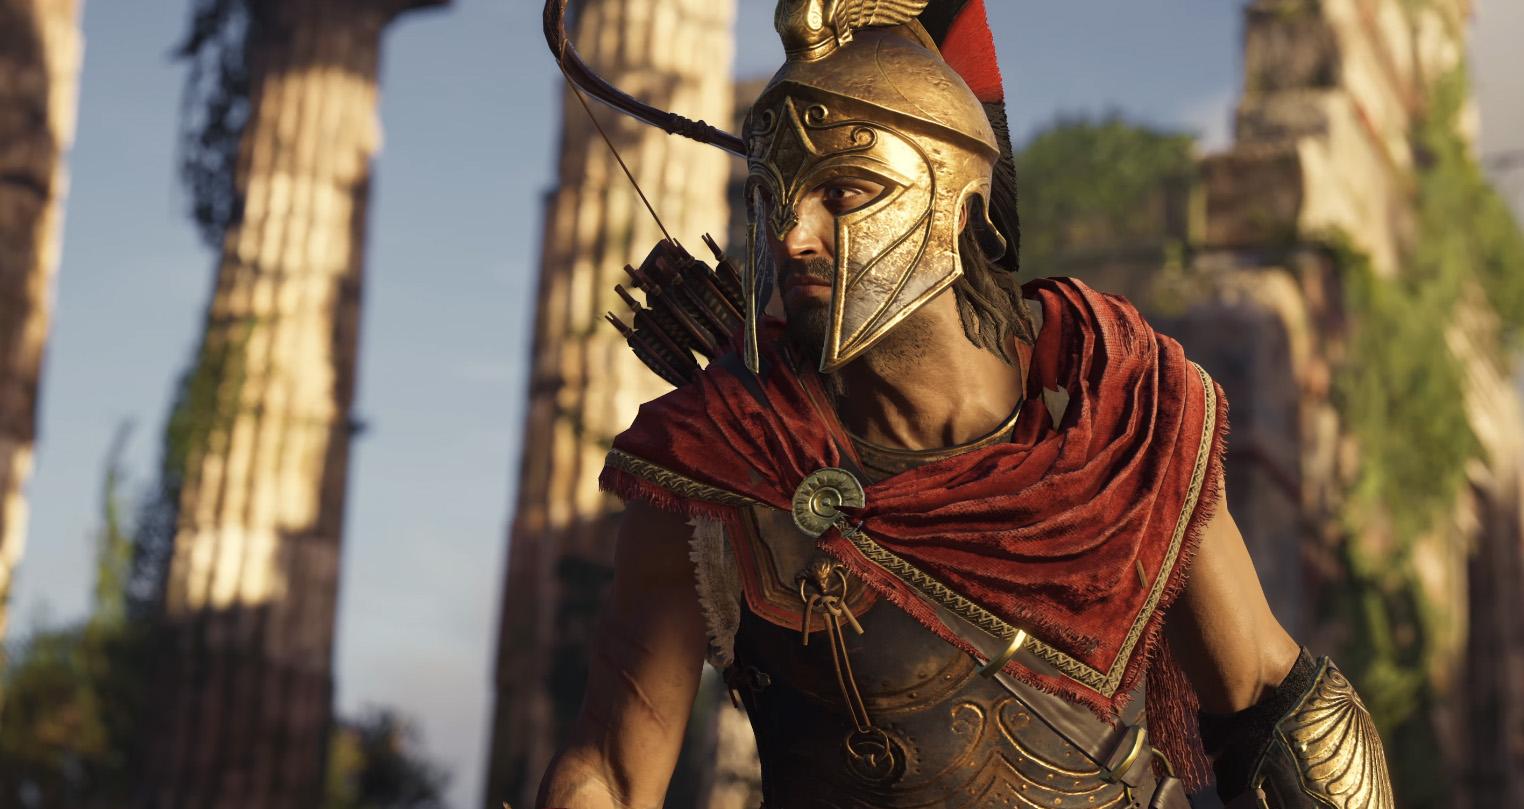 Assassin's Creed Odyssey sets sail on October 5 screenshot